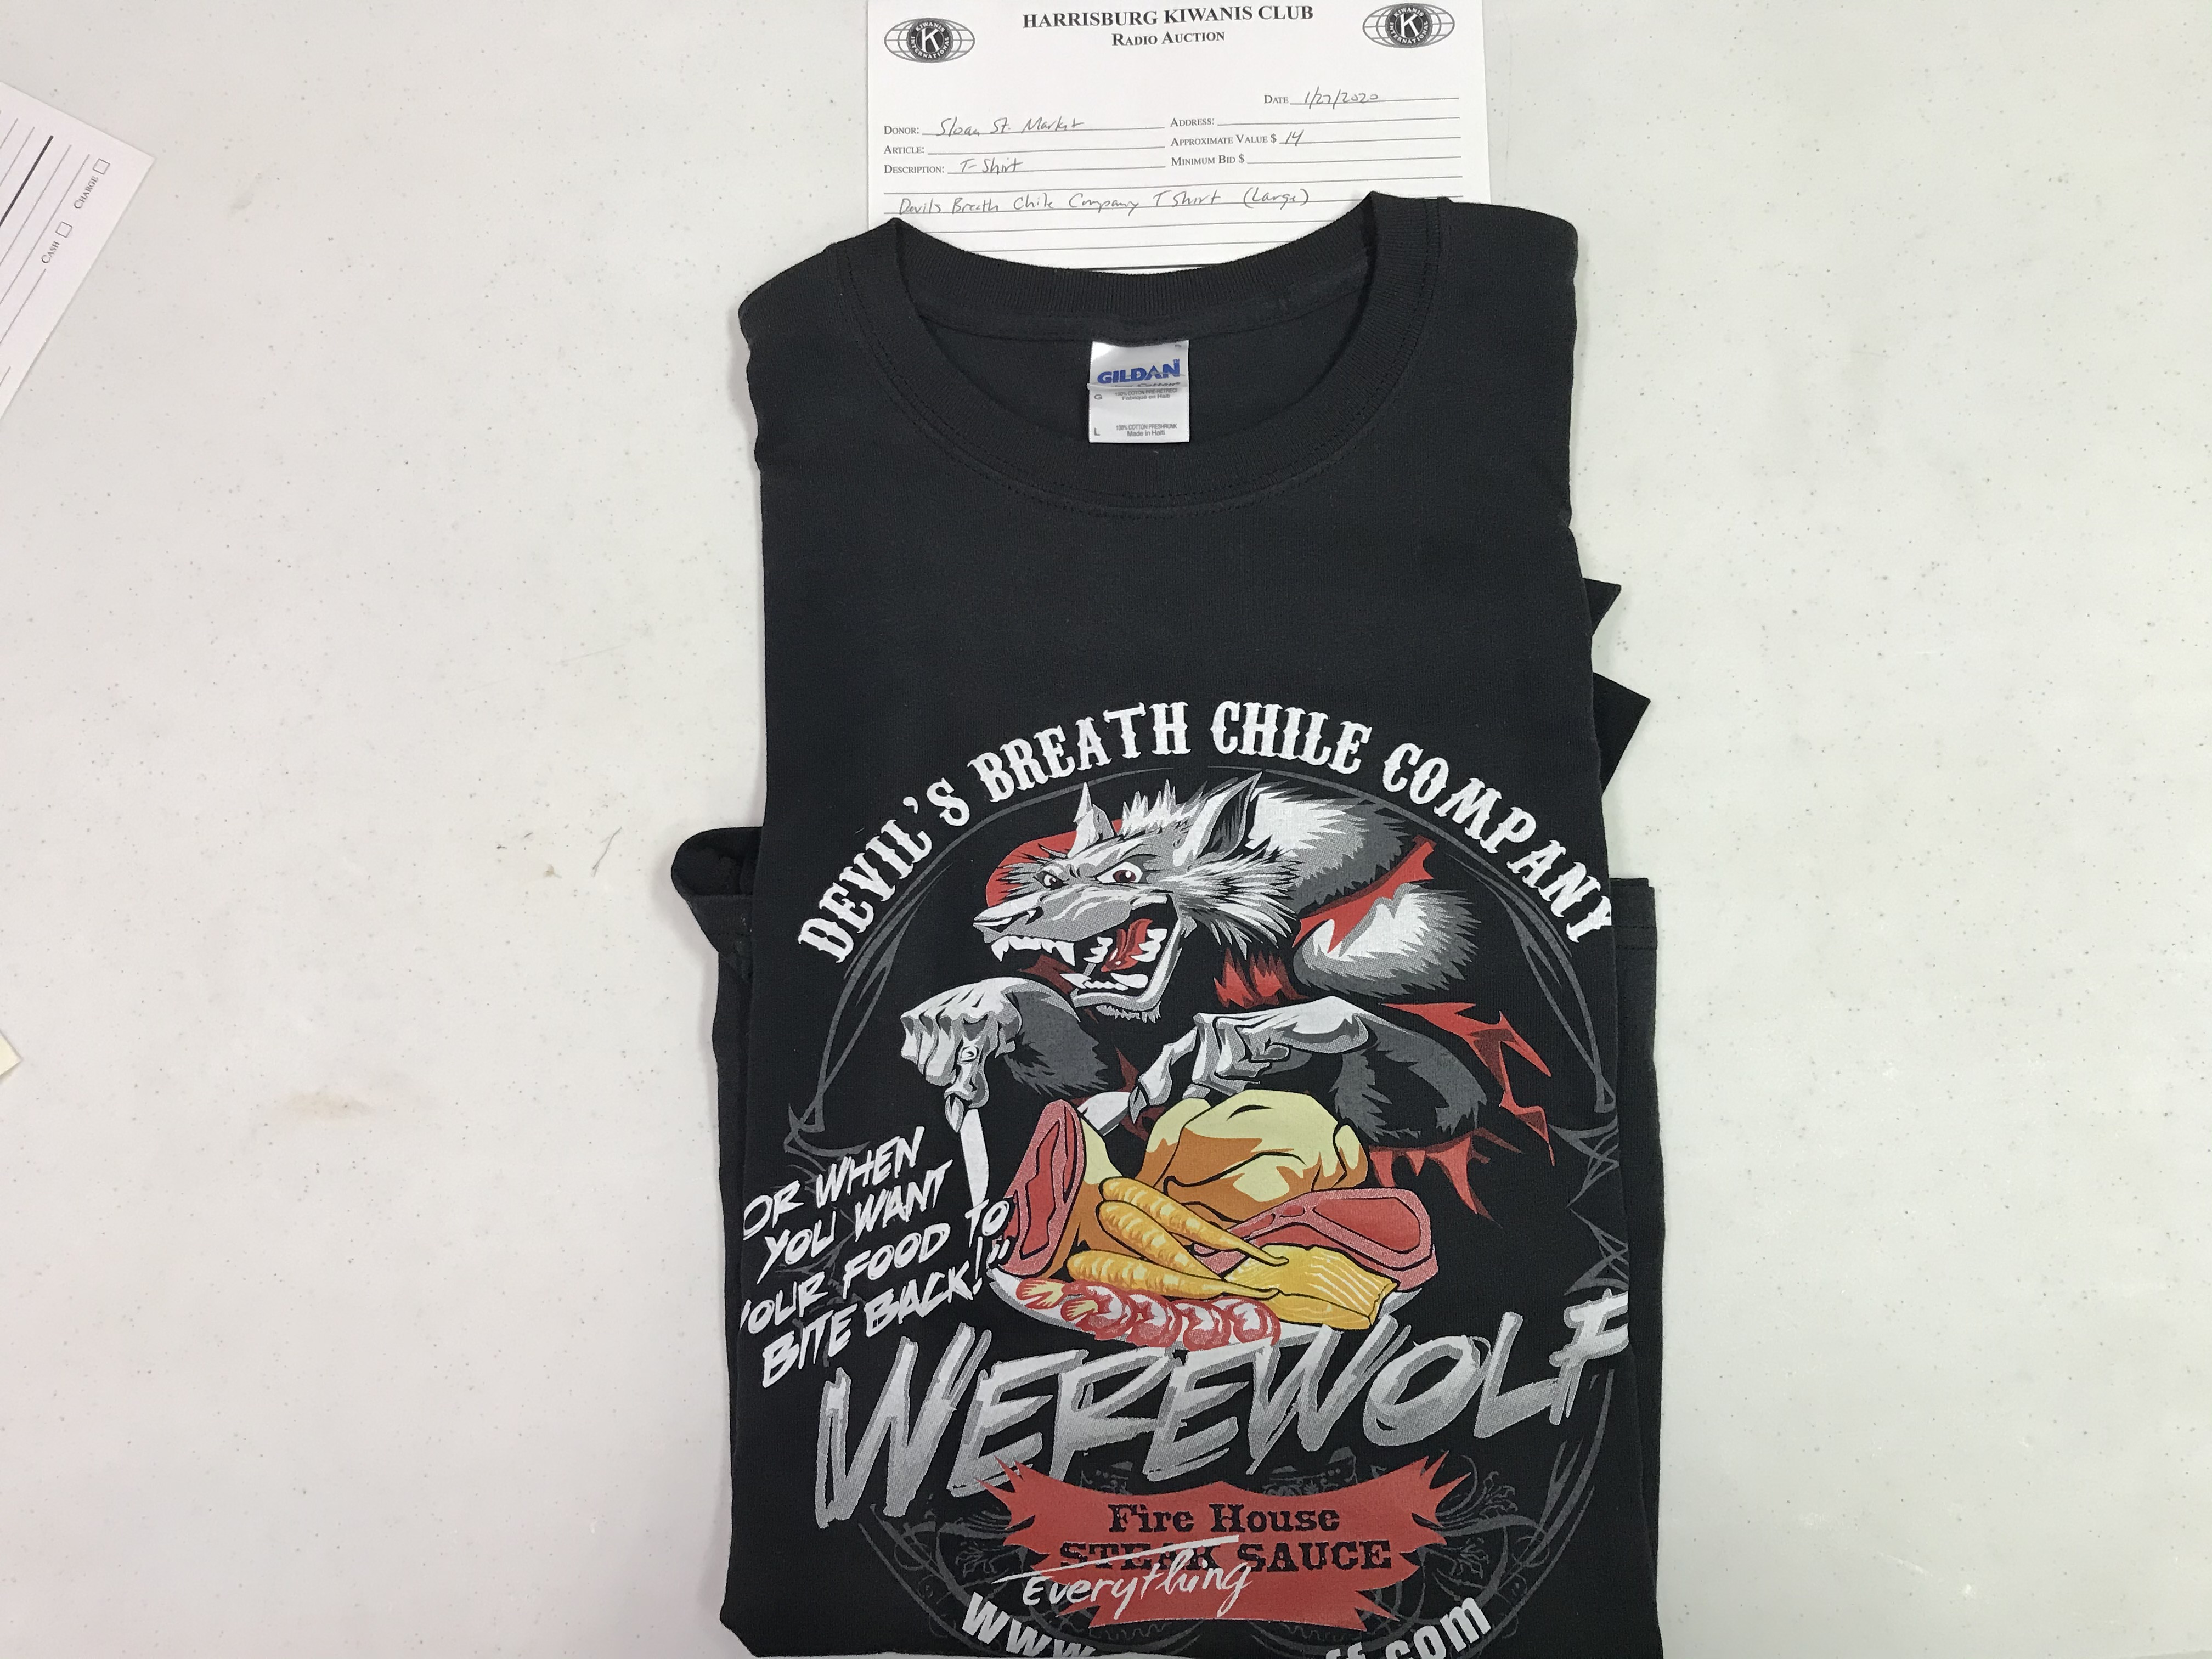 Item 117 - Sloan Street Market Large Devils Breath Chile Company T-Shirt